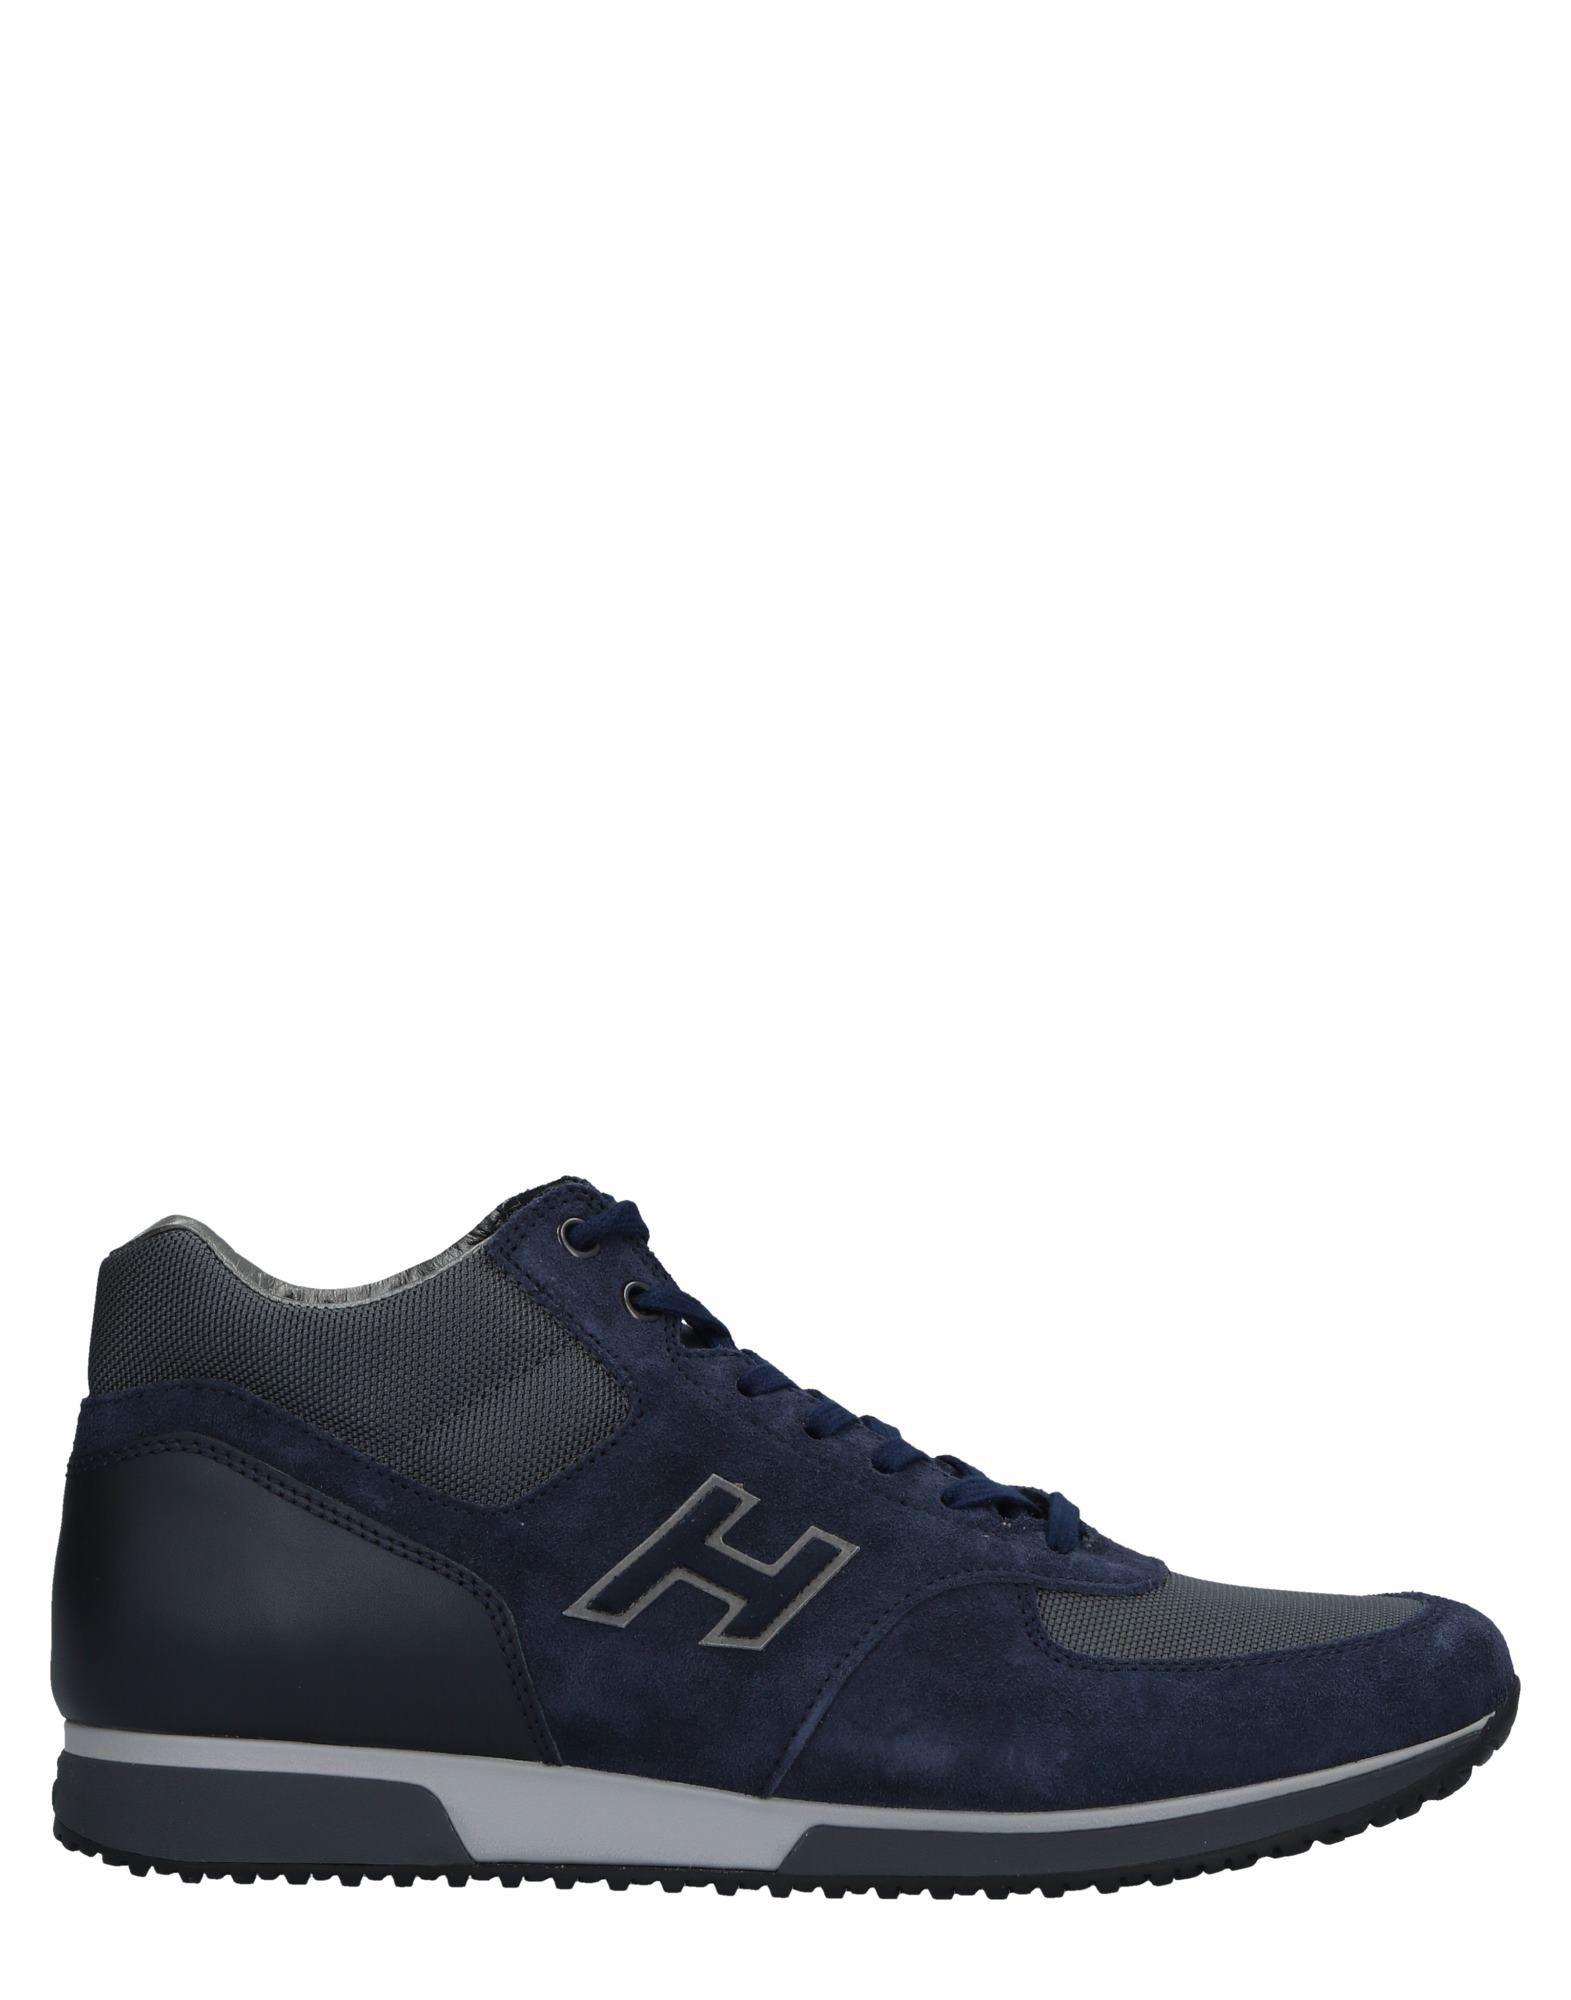 81bd3cca844 HOGAN ΠΑΠΟΥΤΣΙΑ Χαμηλά sneakers, Ανδρικά sneakers, ΑΝΔΡΑΣ ...